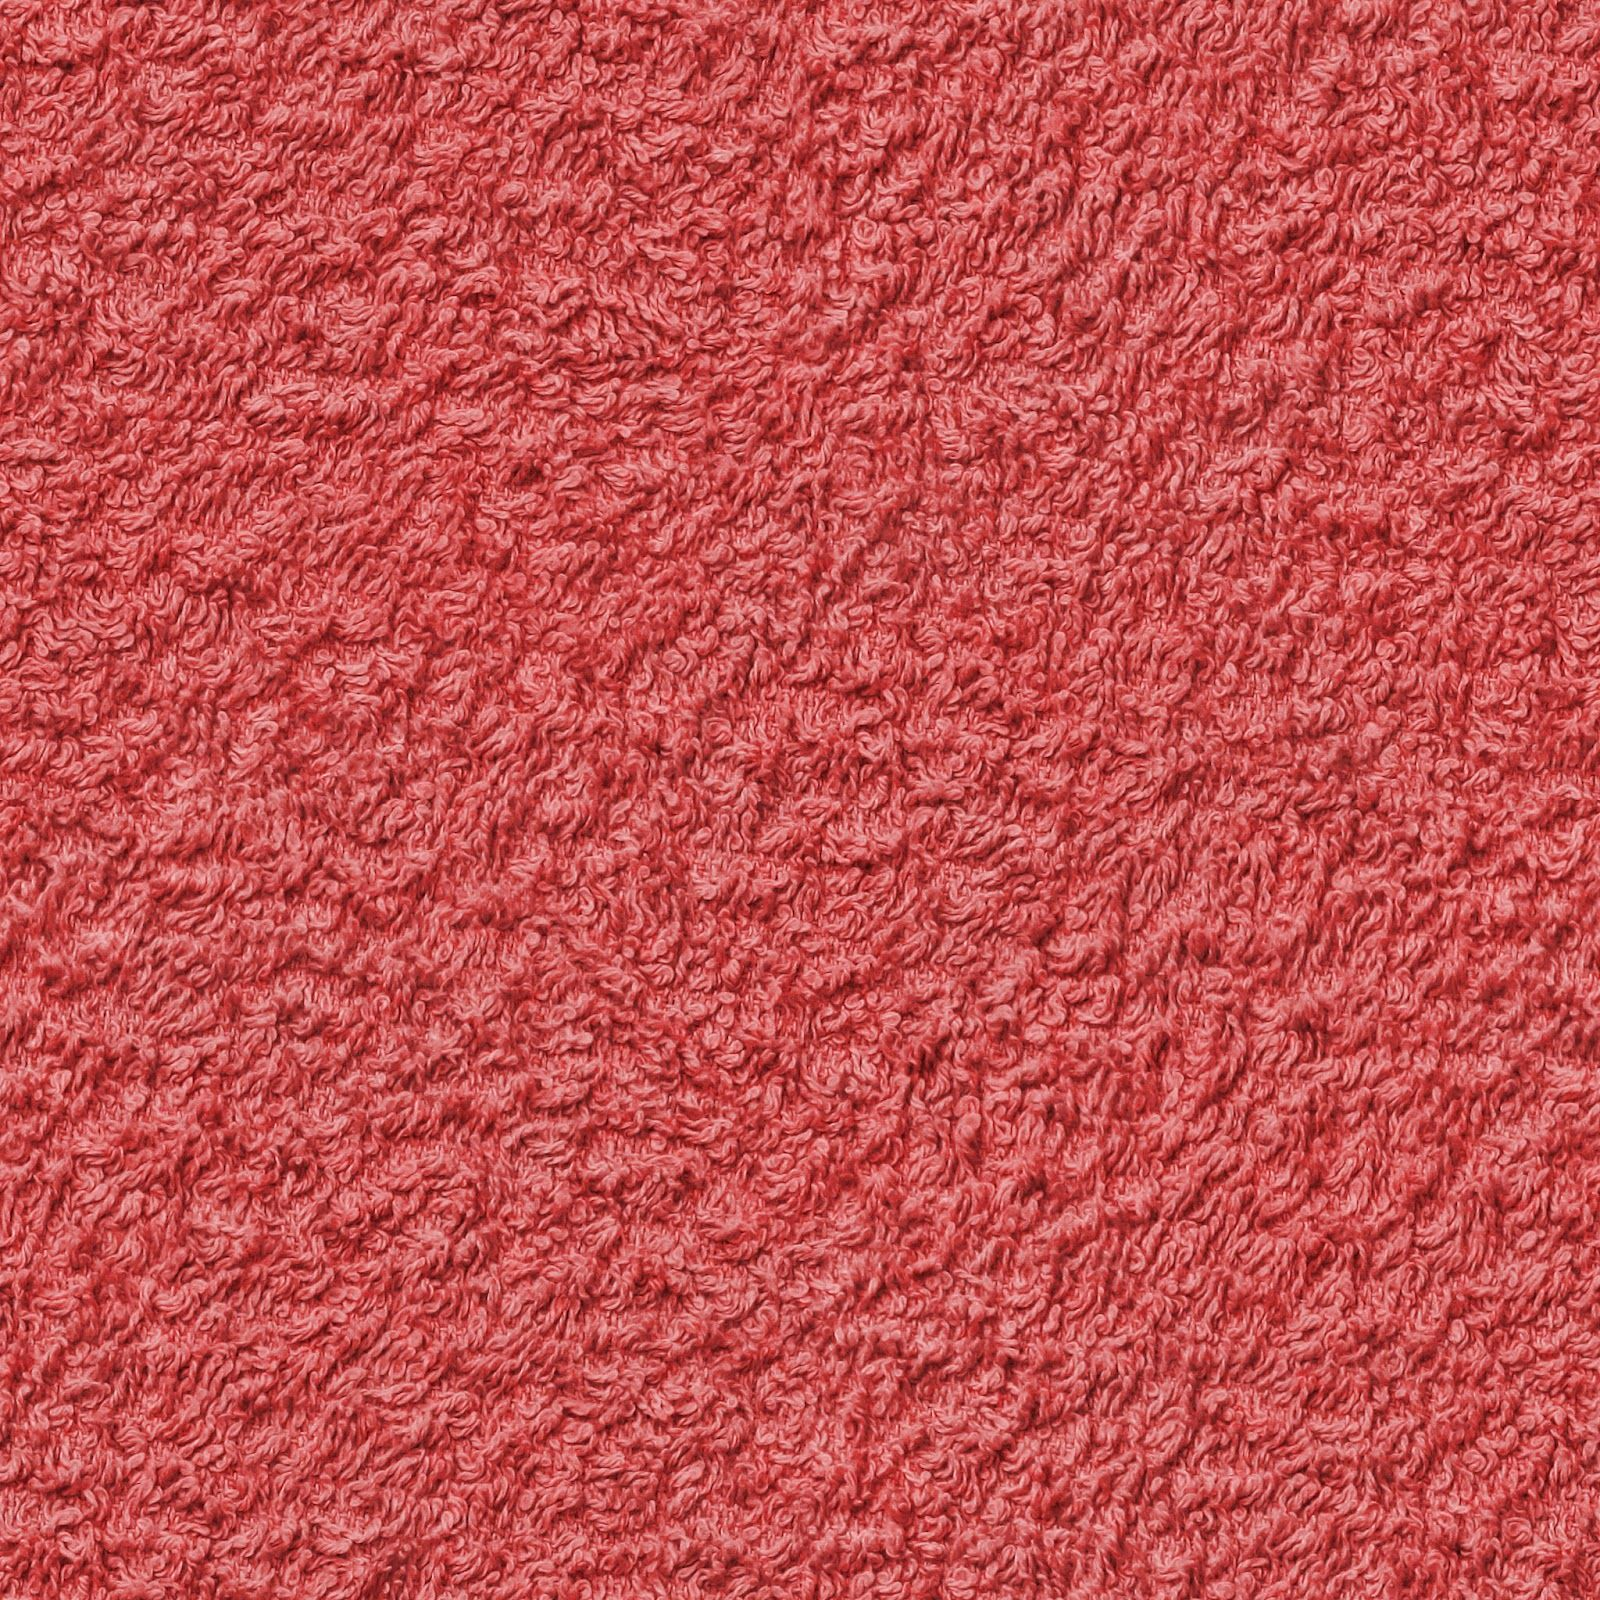 http://seamless-pixels.blogspot.co.uk/2012_02_01_archive.html